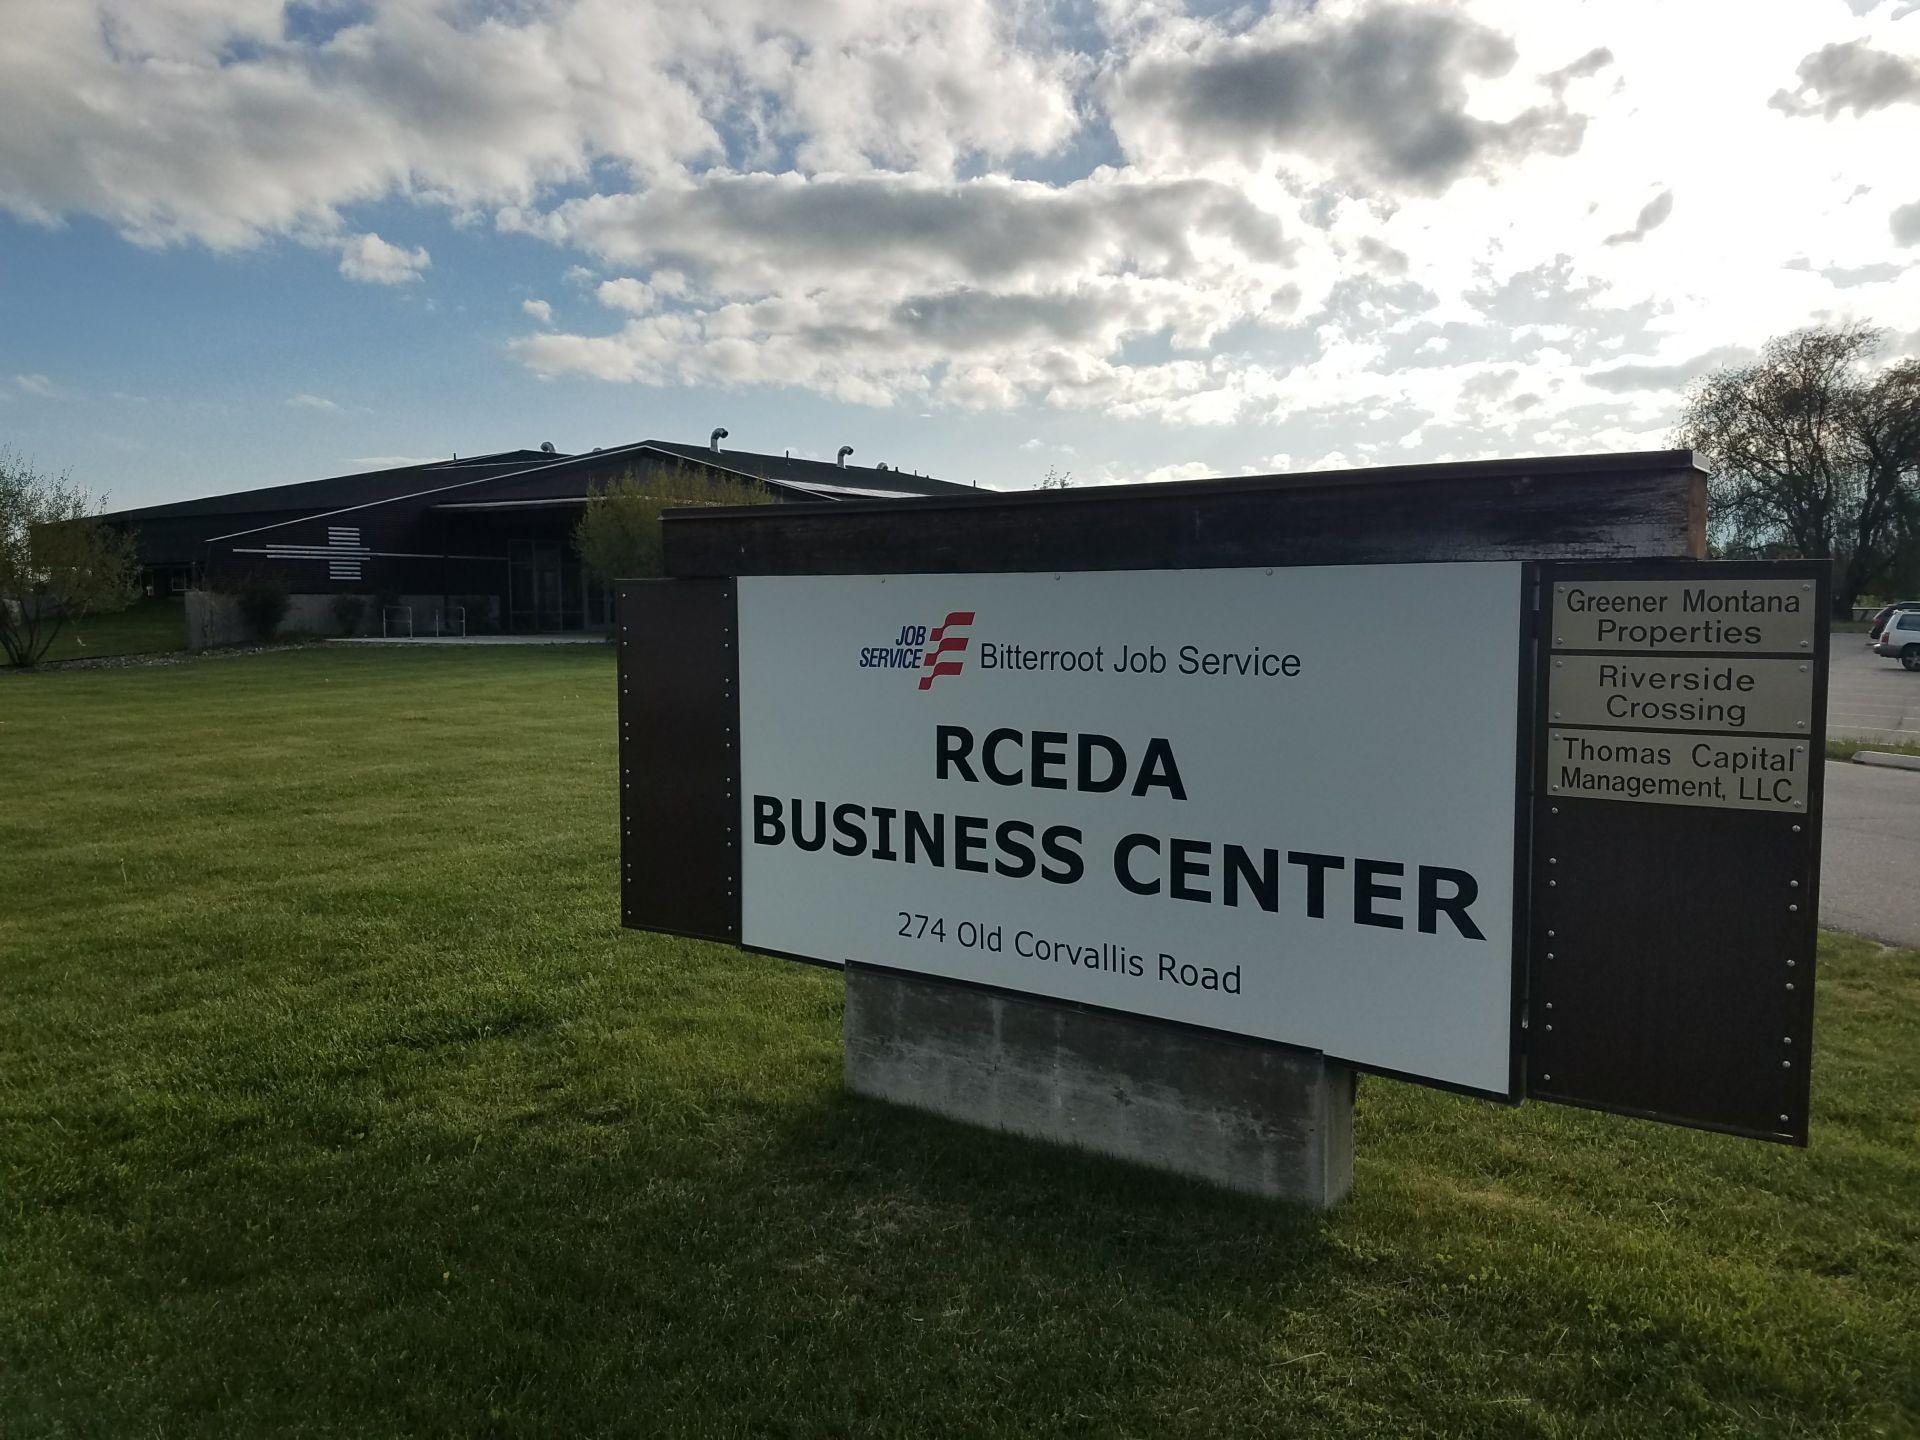 RCEDA Business Center